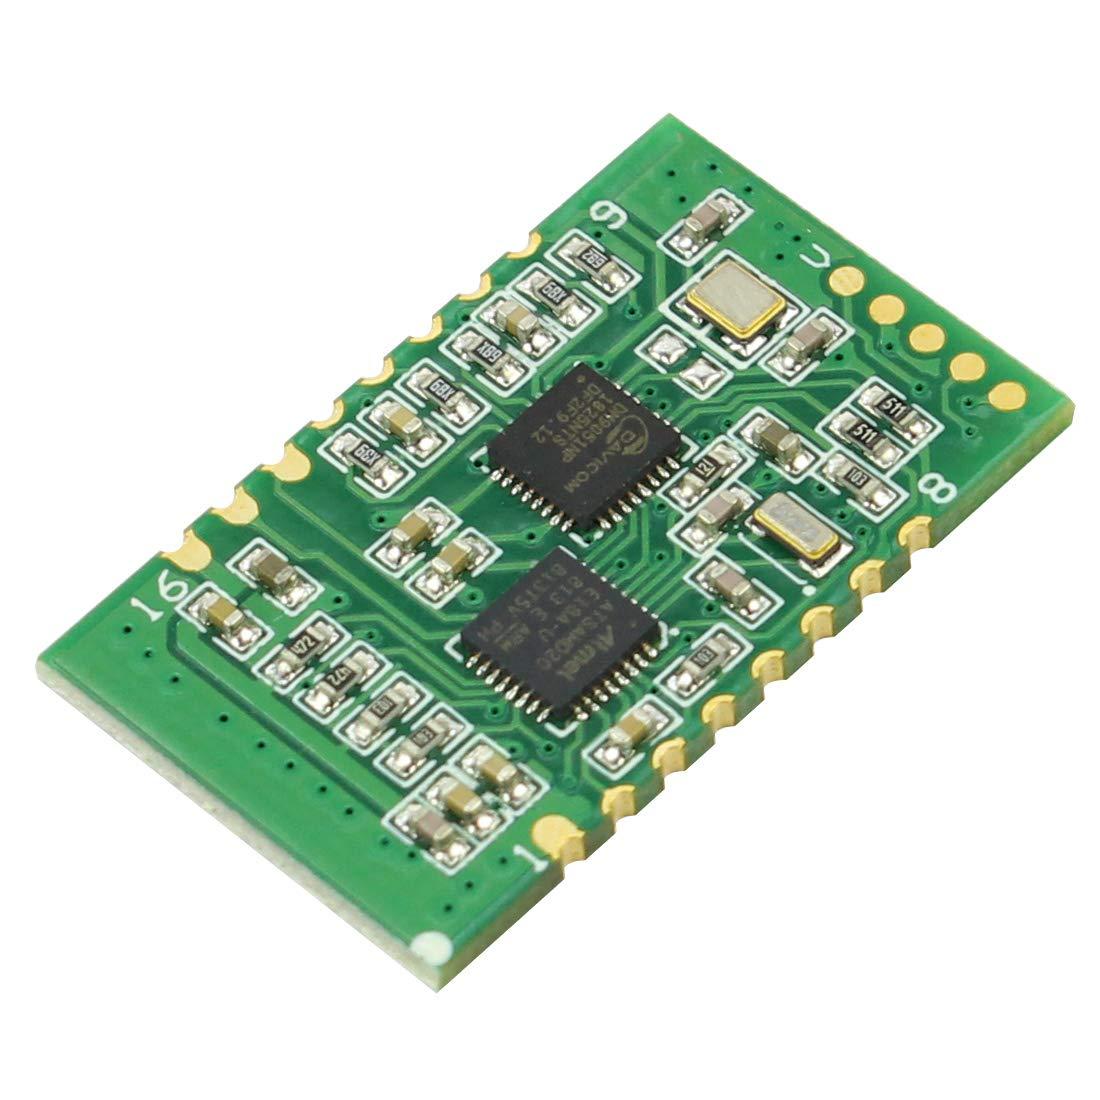 USR-TCP232-S2 SMT Serial UART TTL to TCPIP// Ethernet Module Support DHCP//Webpage